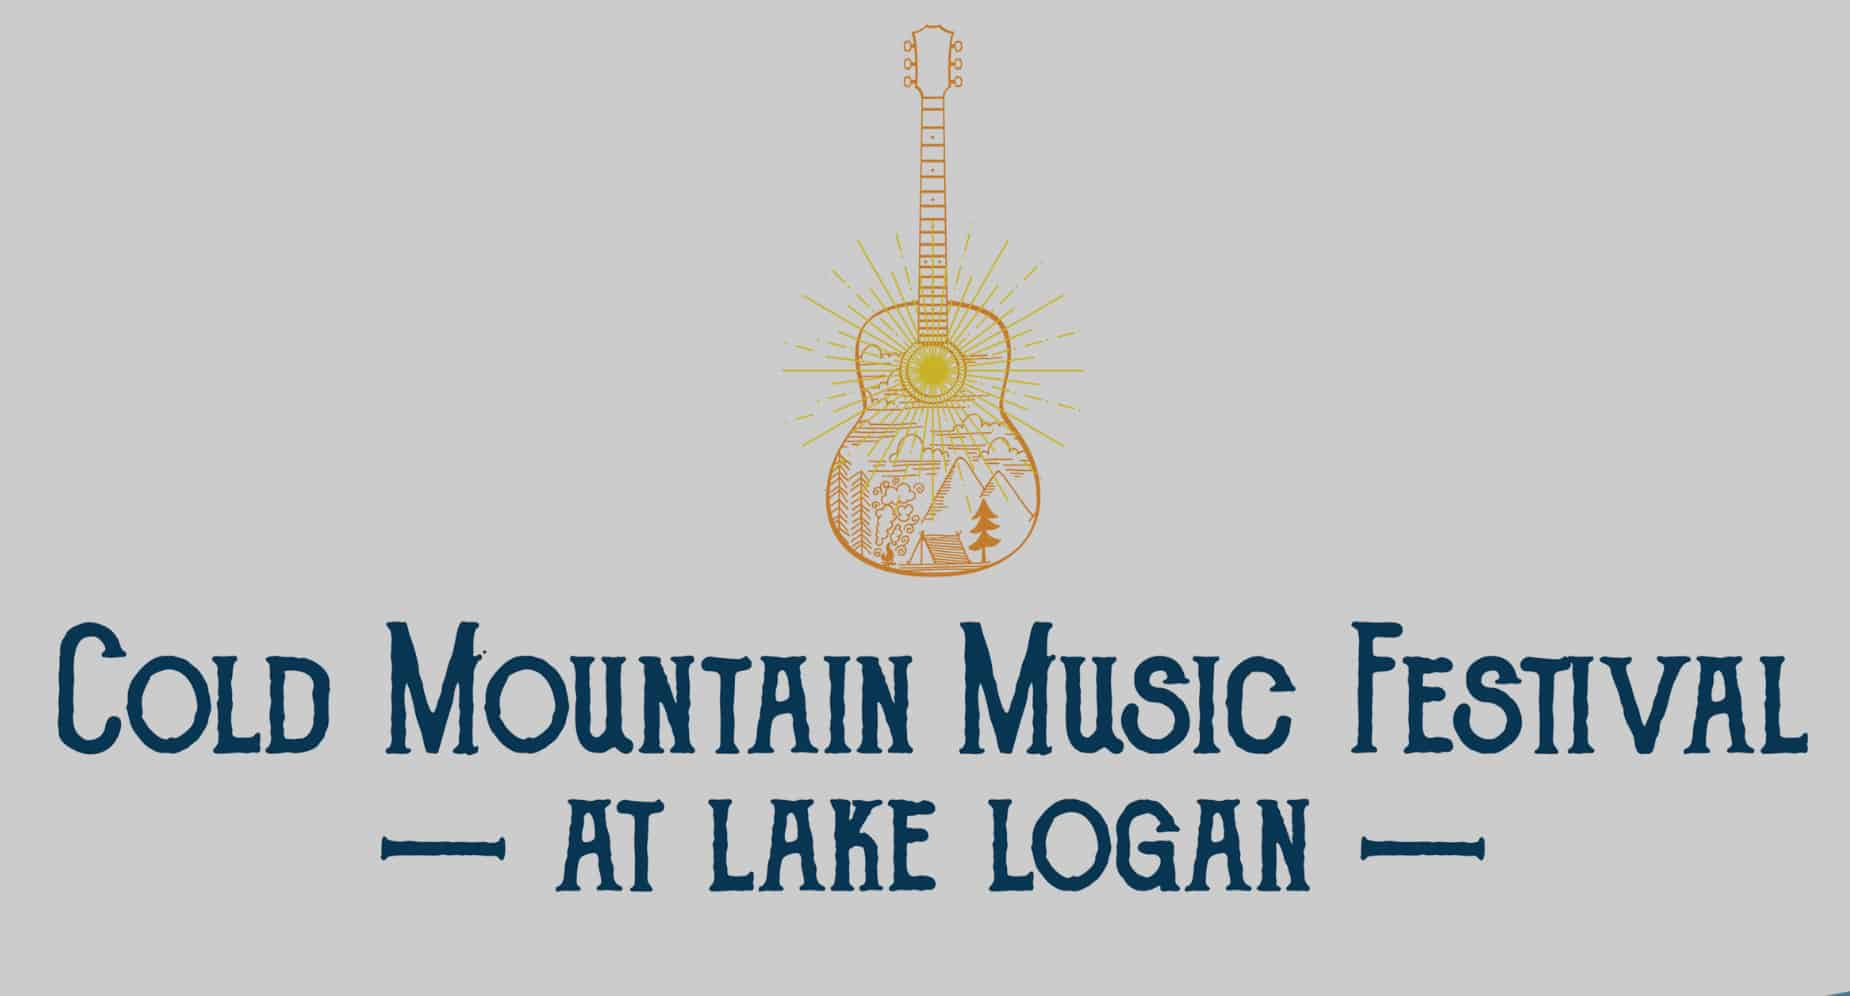 Cold Mountain Music Festival at Lake Logan